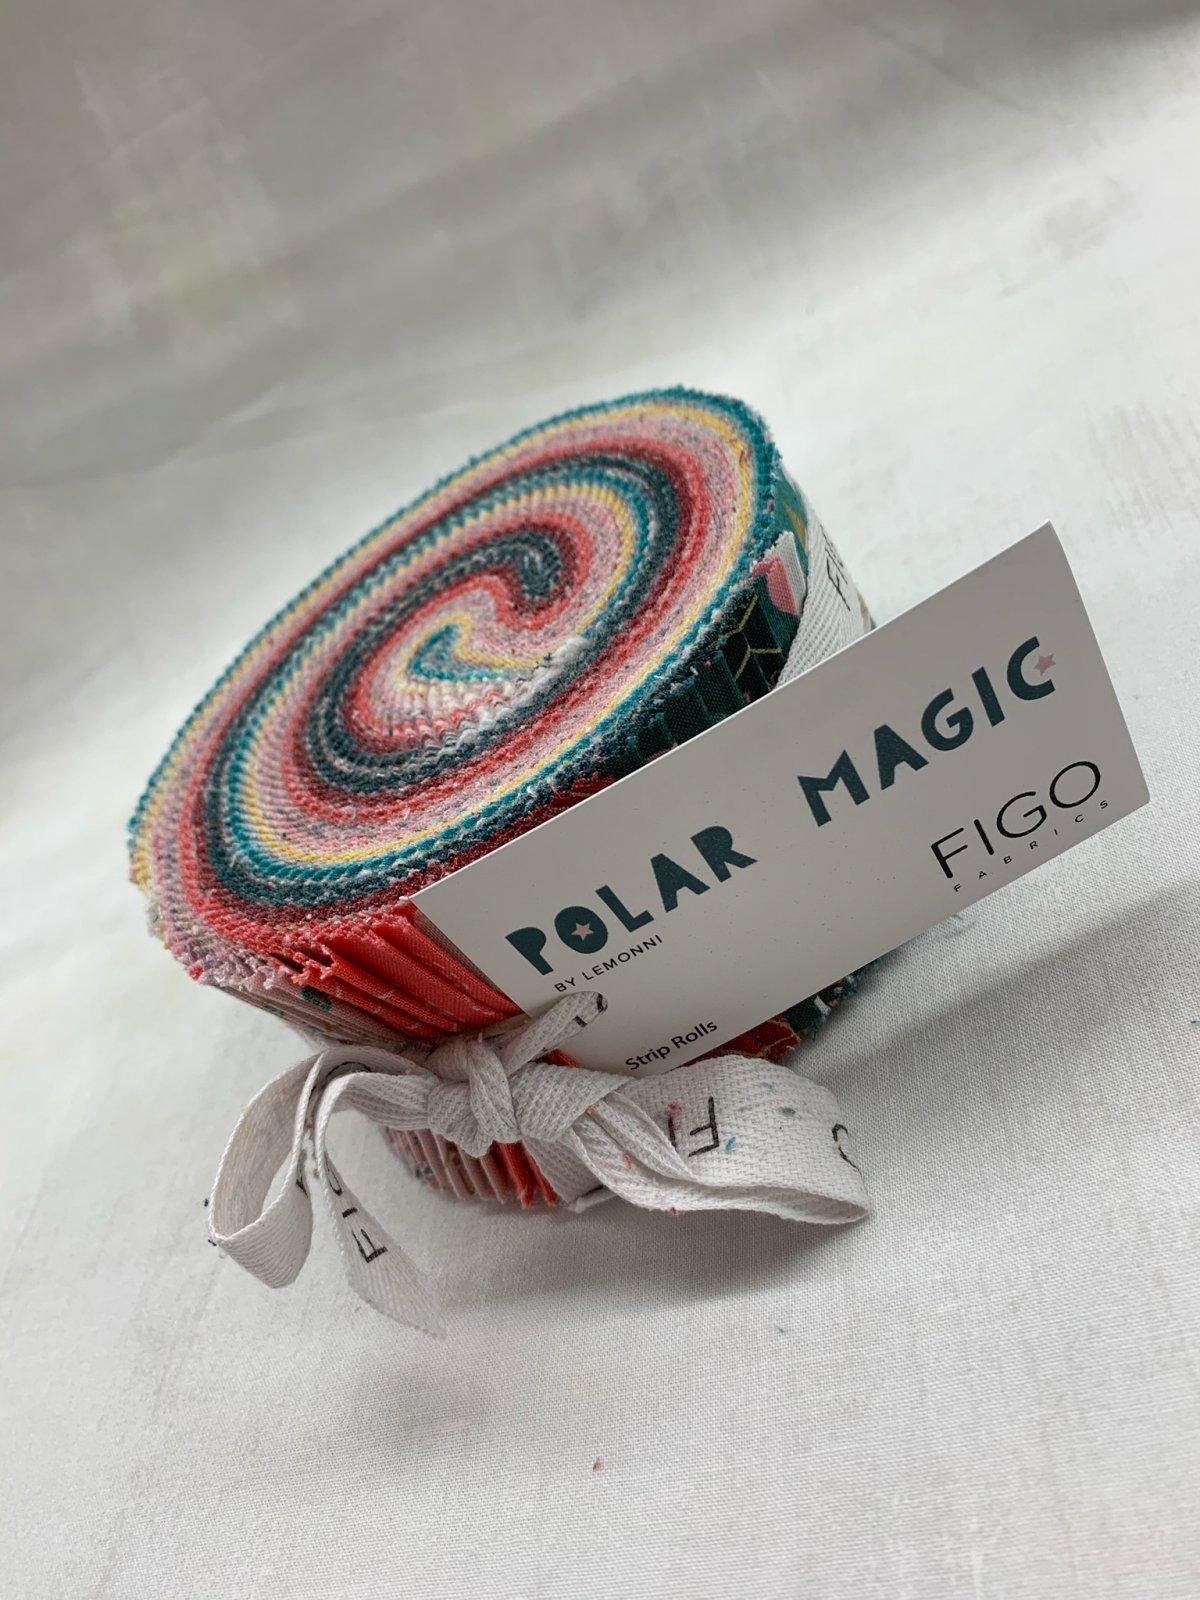 Figo- Lemonni- Polar Magic Jelly Roll JPOLARM40-62